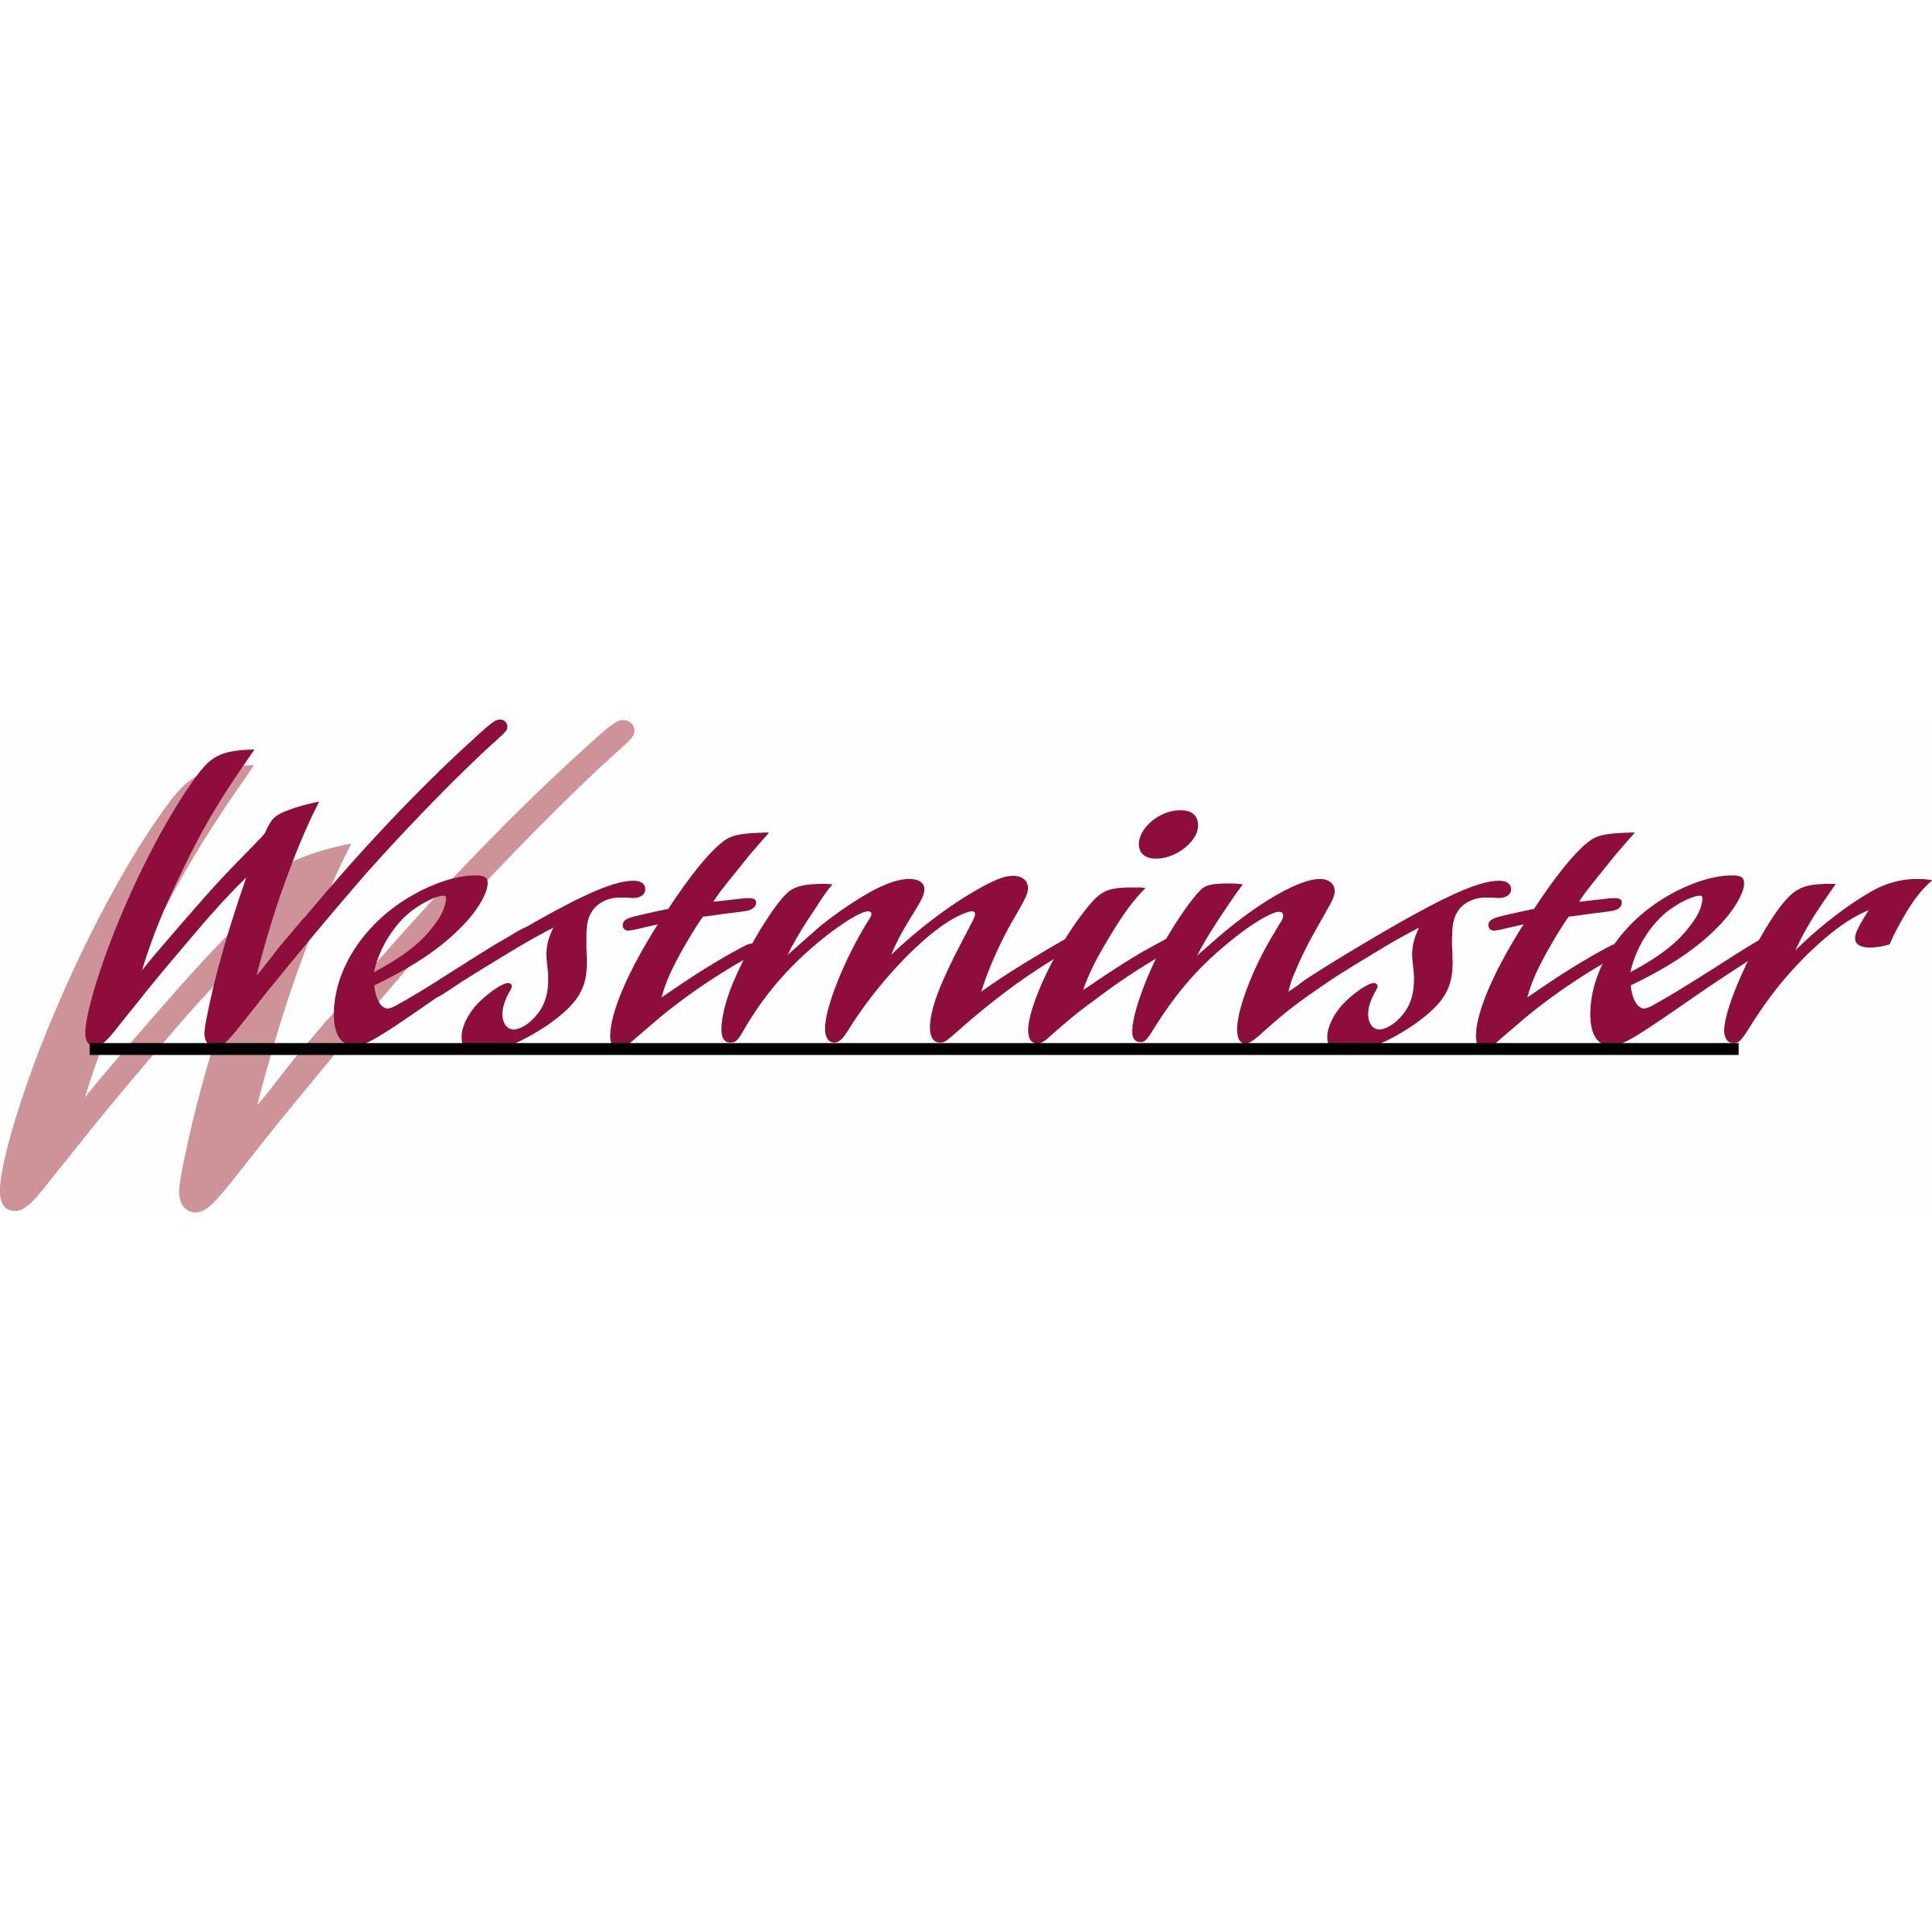 Westminster Senior Apartments - Madison, WI - Retirement Communities